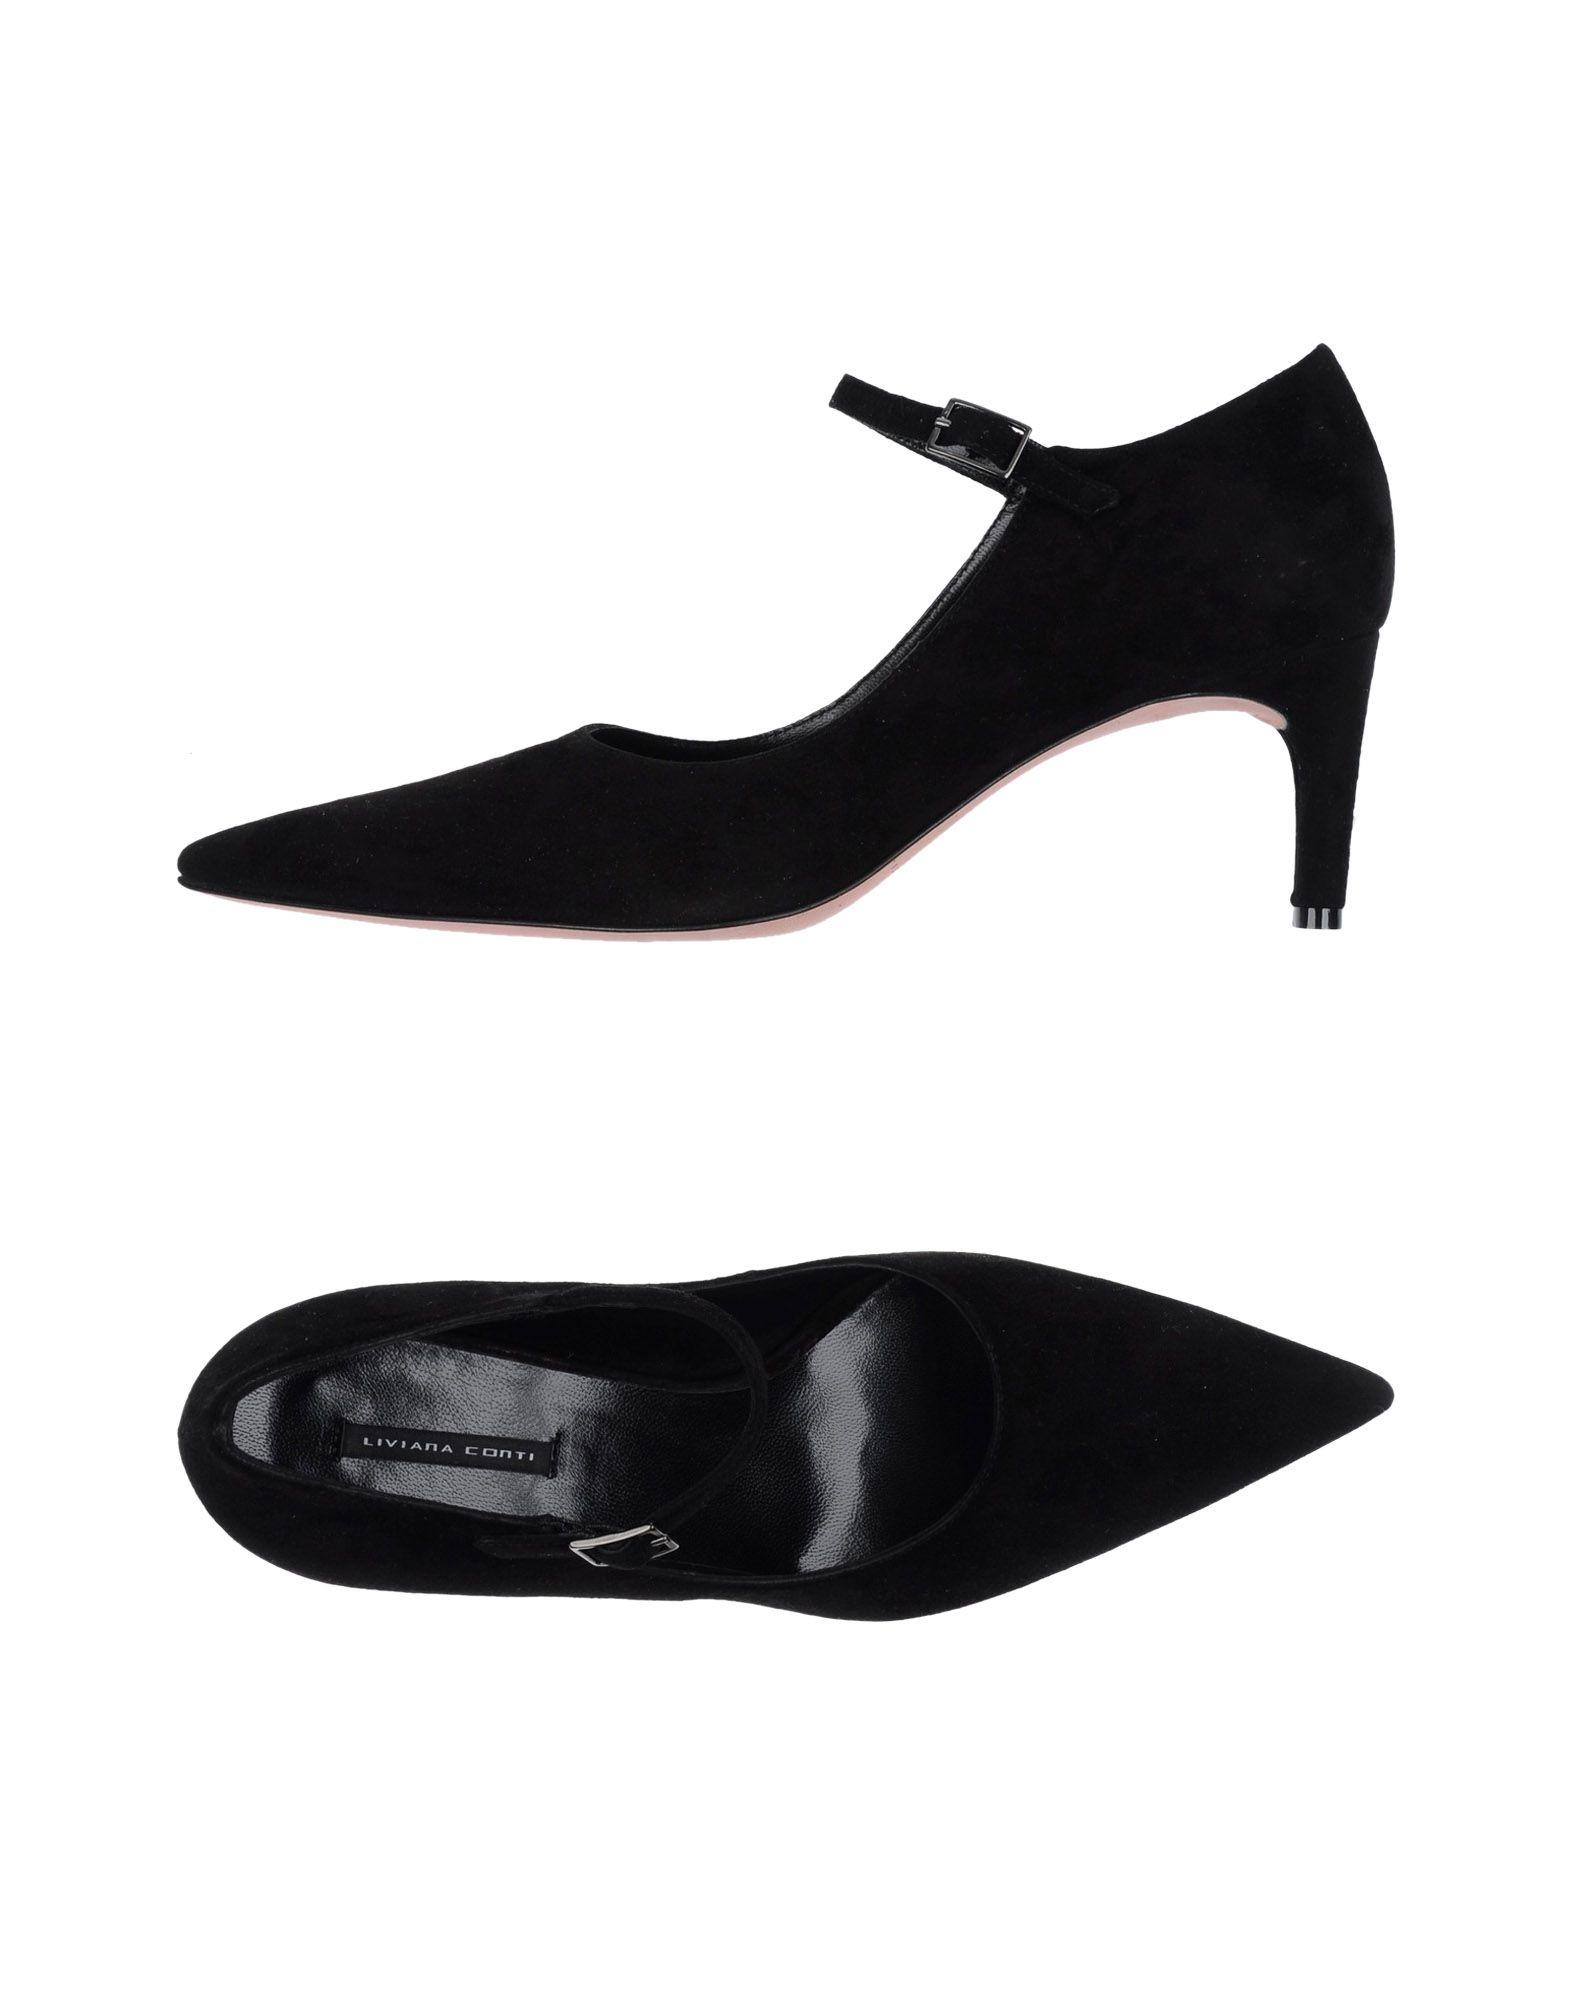 Stilvolle billige Schuhe Liviana Conti Pumps Damen  11250742NP